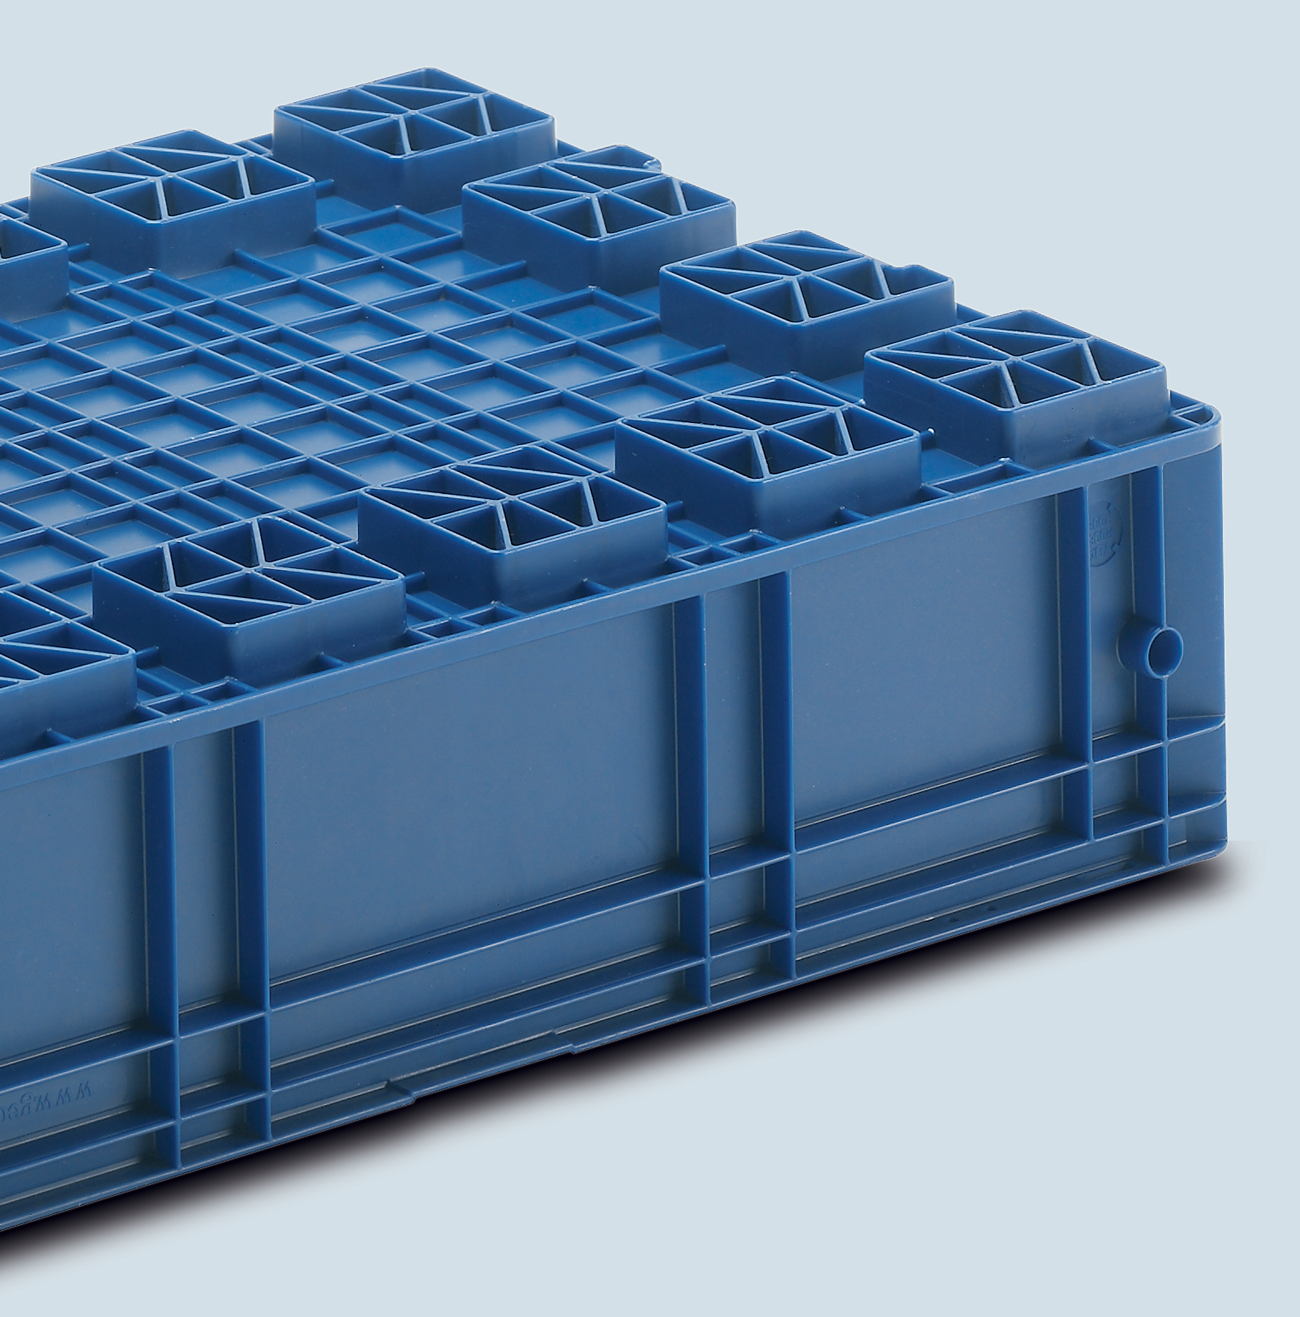 Plastic Container VDA-R-KLT 6415, Automotive Industry